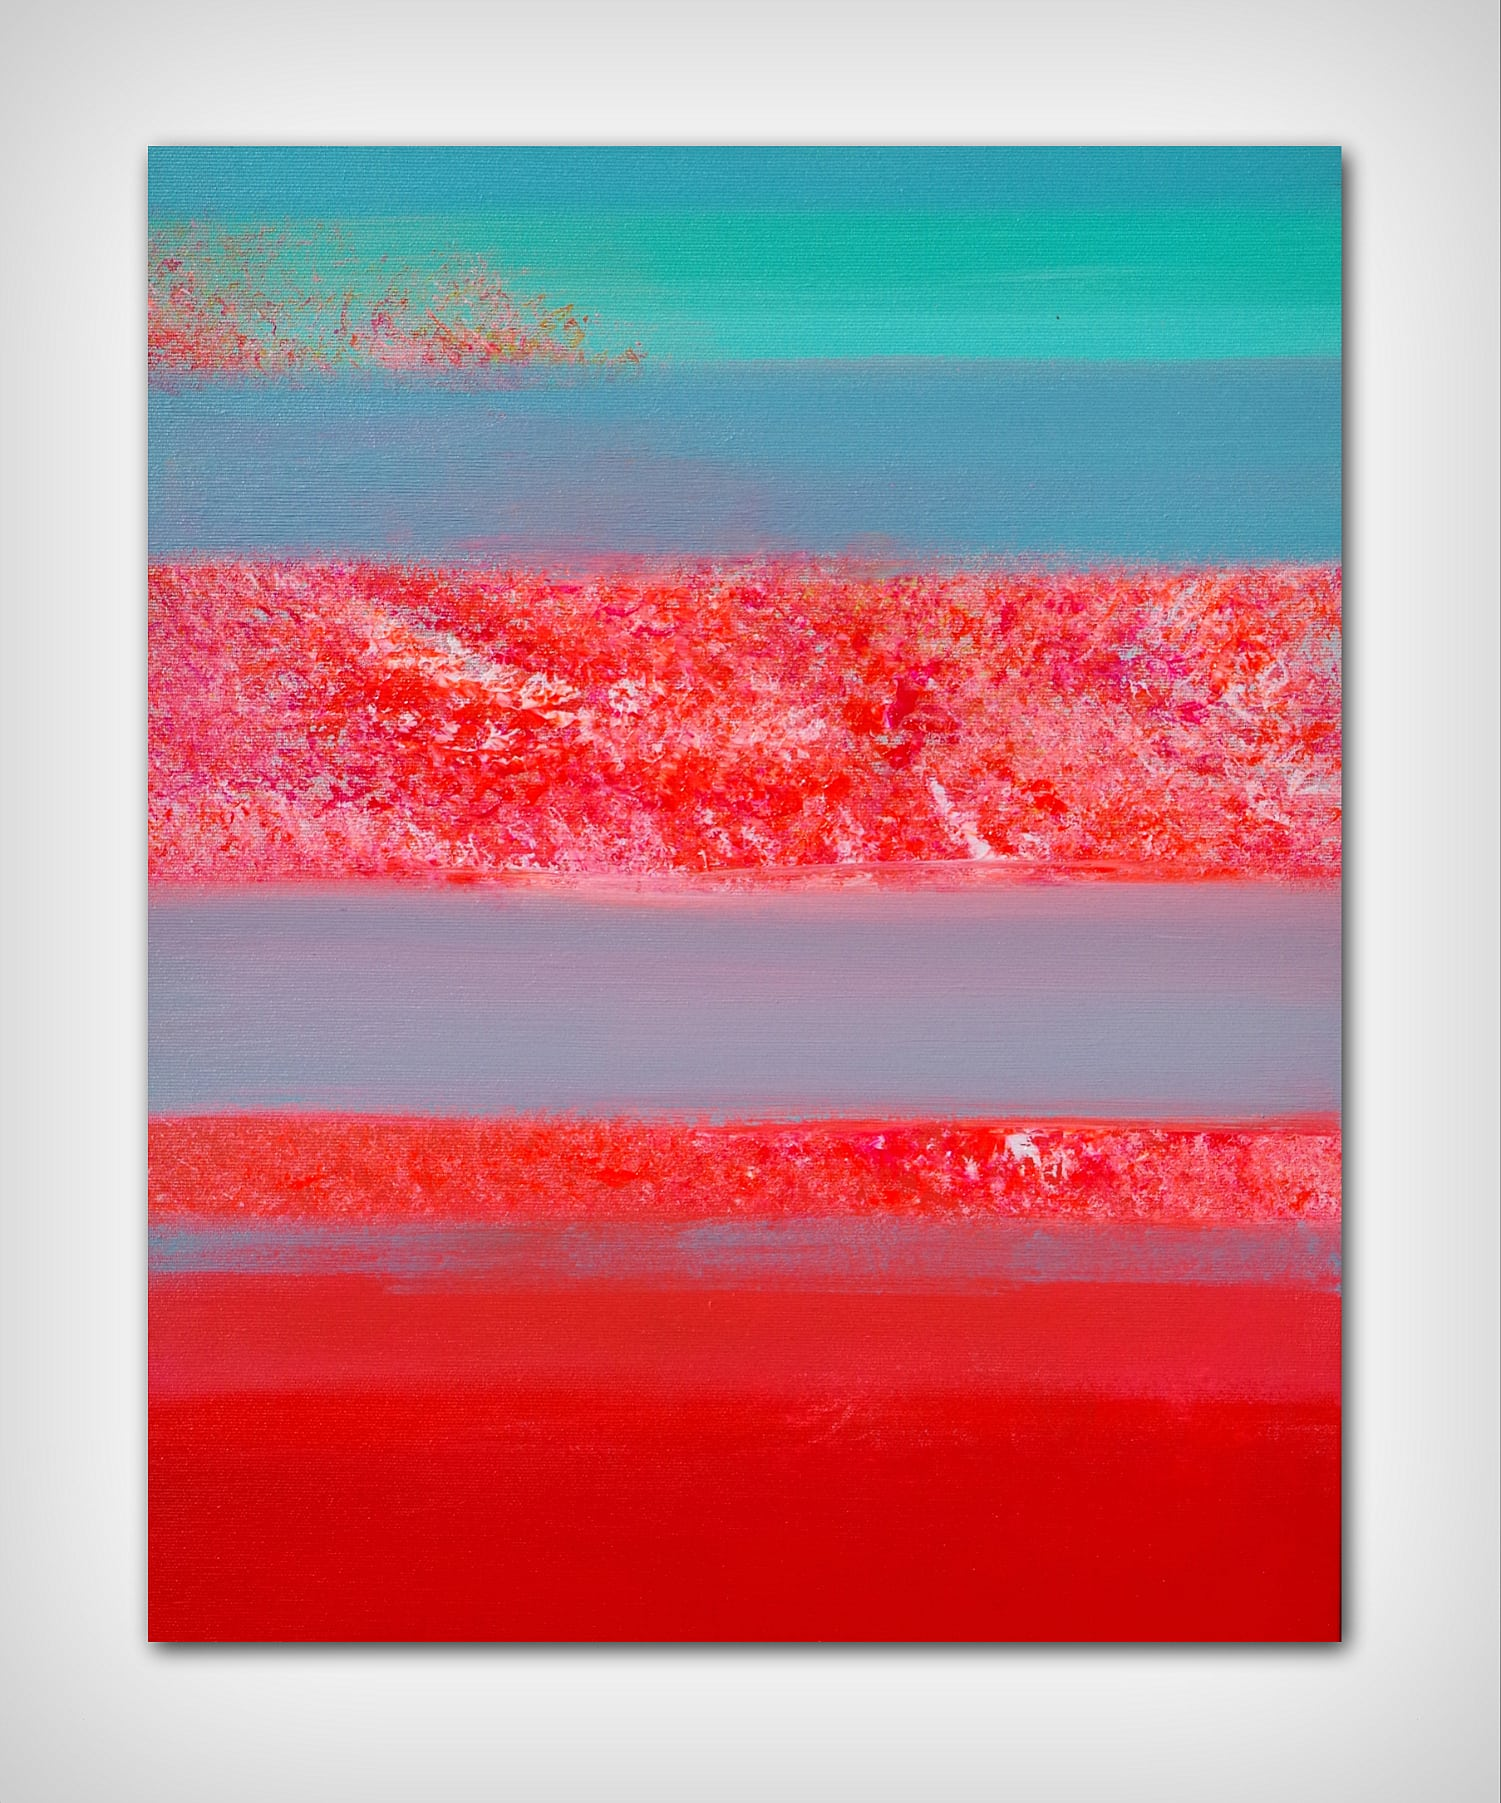 Horizons, 1 40×50 acrylic_quadro astratto in vendita online